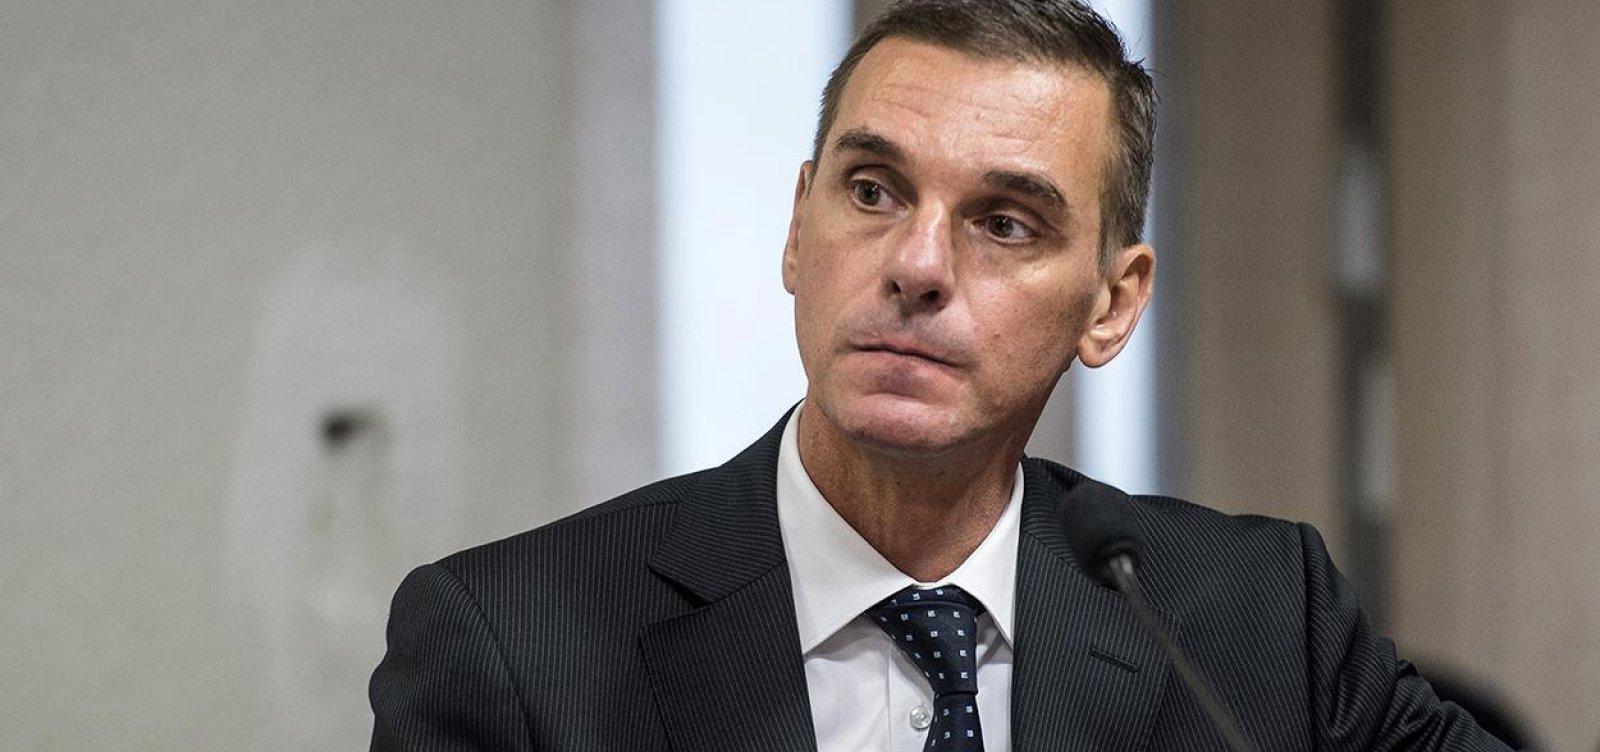 [Presidente do Banco do Brasil, André Brandão entrega o cargo ]